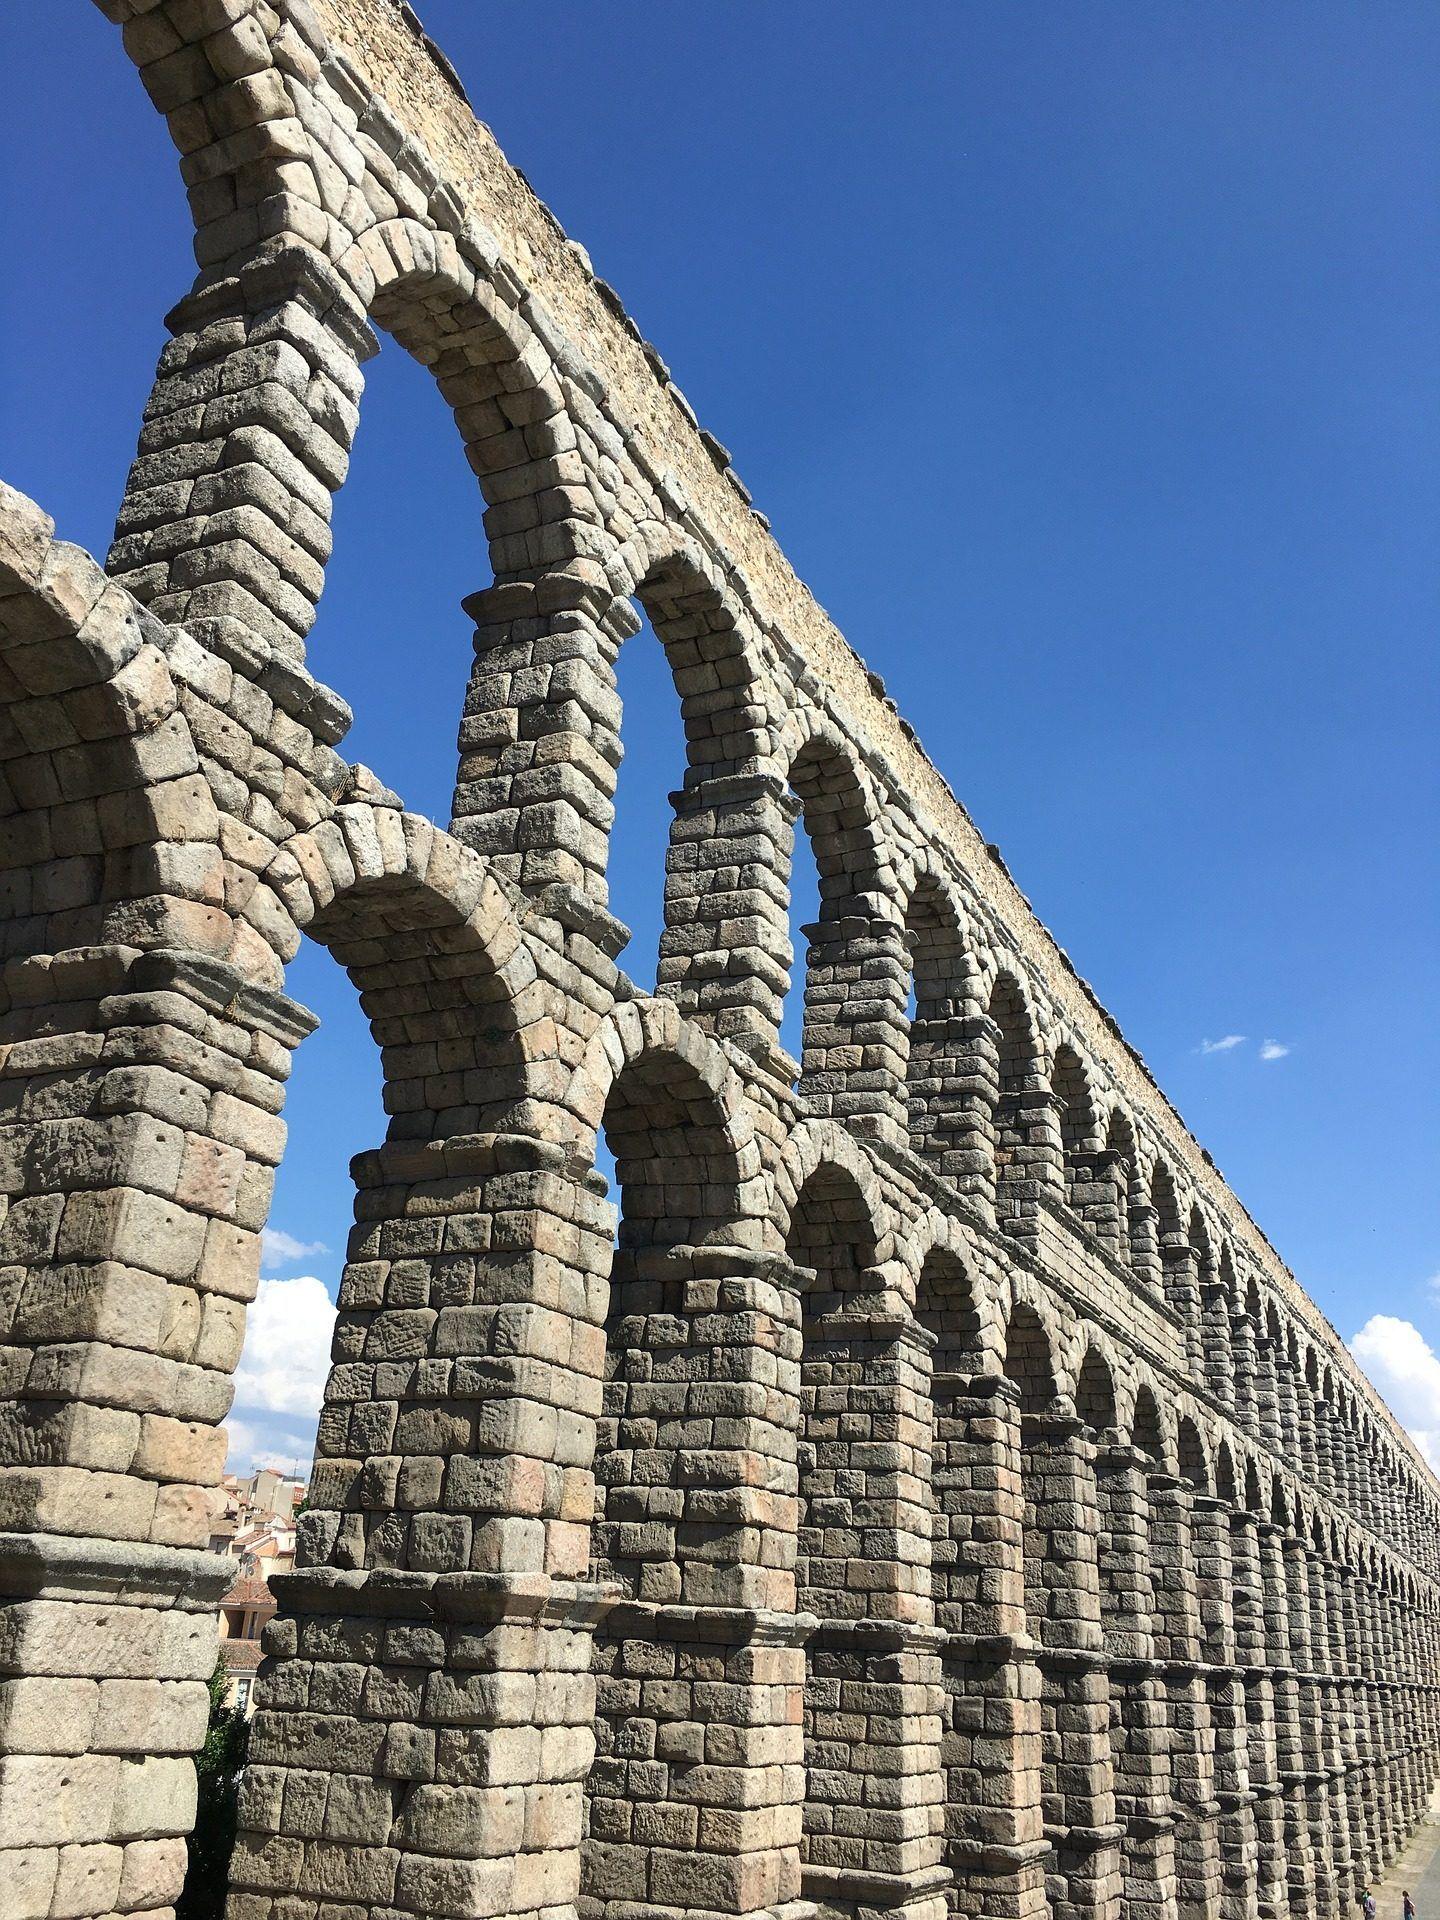 Monumento arquitectura acueducto romano segovia 1701100820 fondos de pantalla hd hd - Acueducto de segovia arquitectura ...